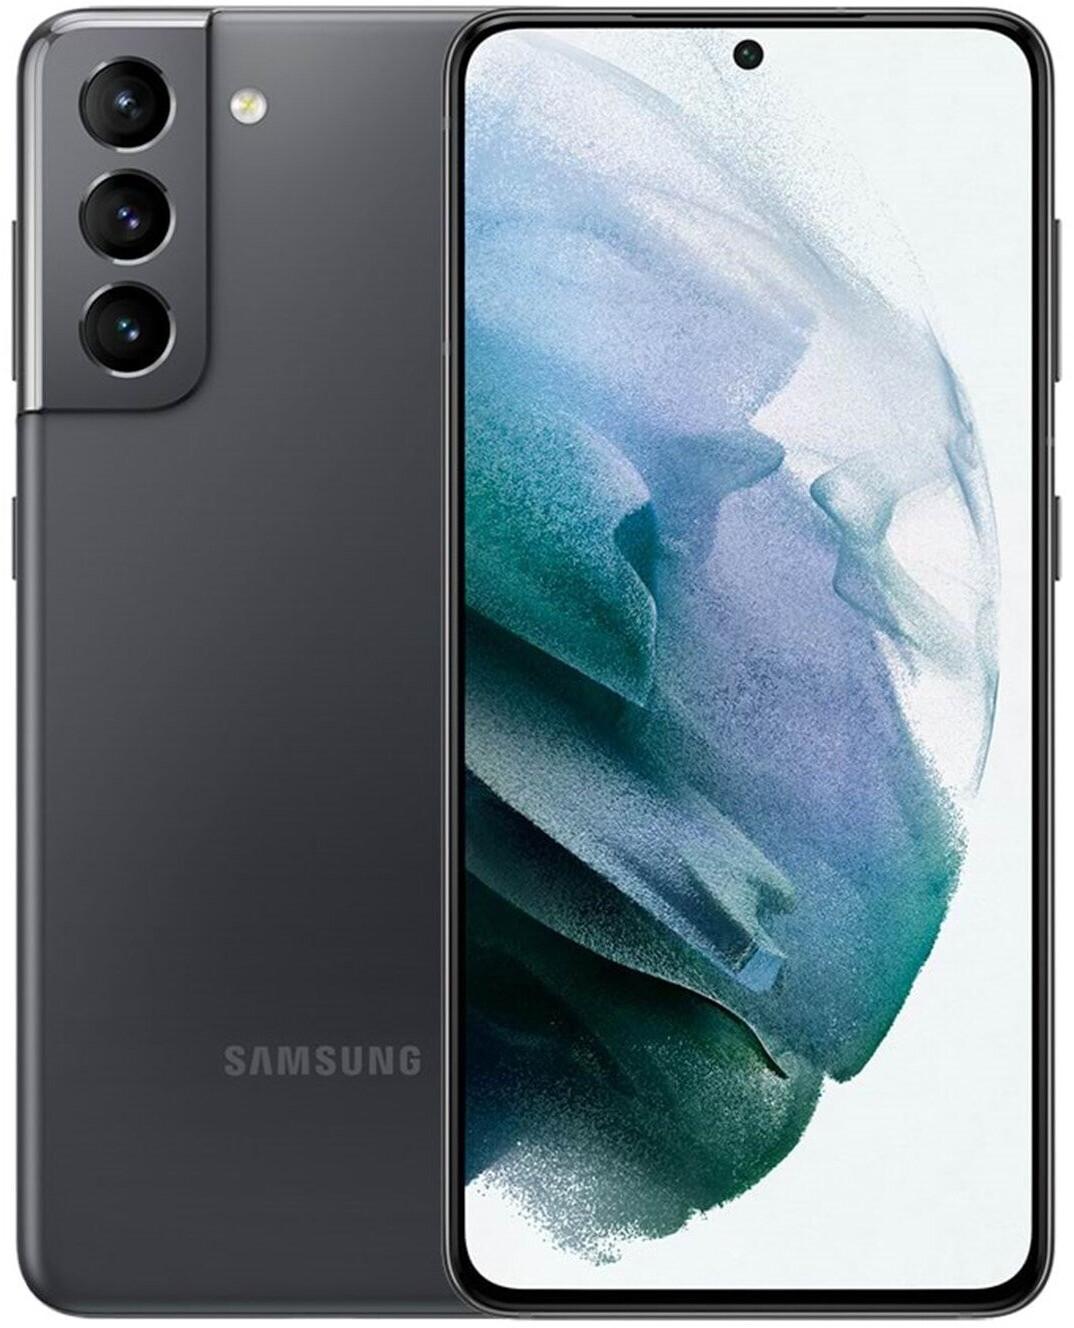 iphone 13 pro max-comparison_table-m-3